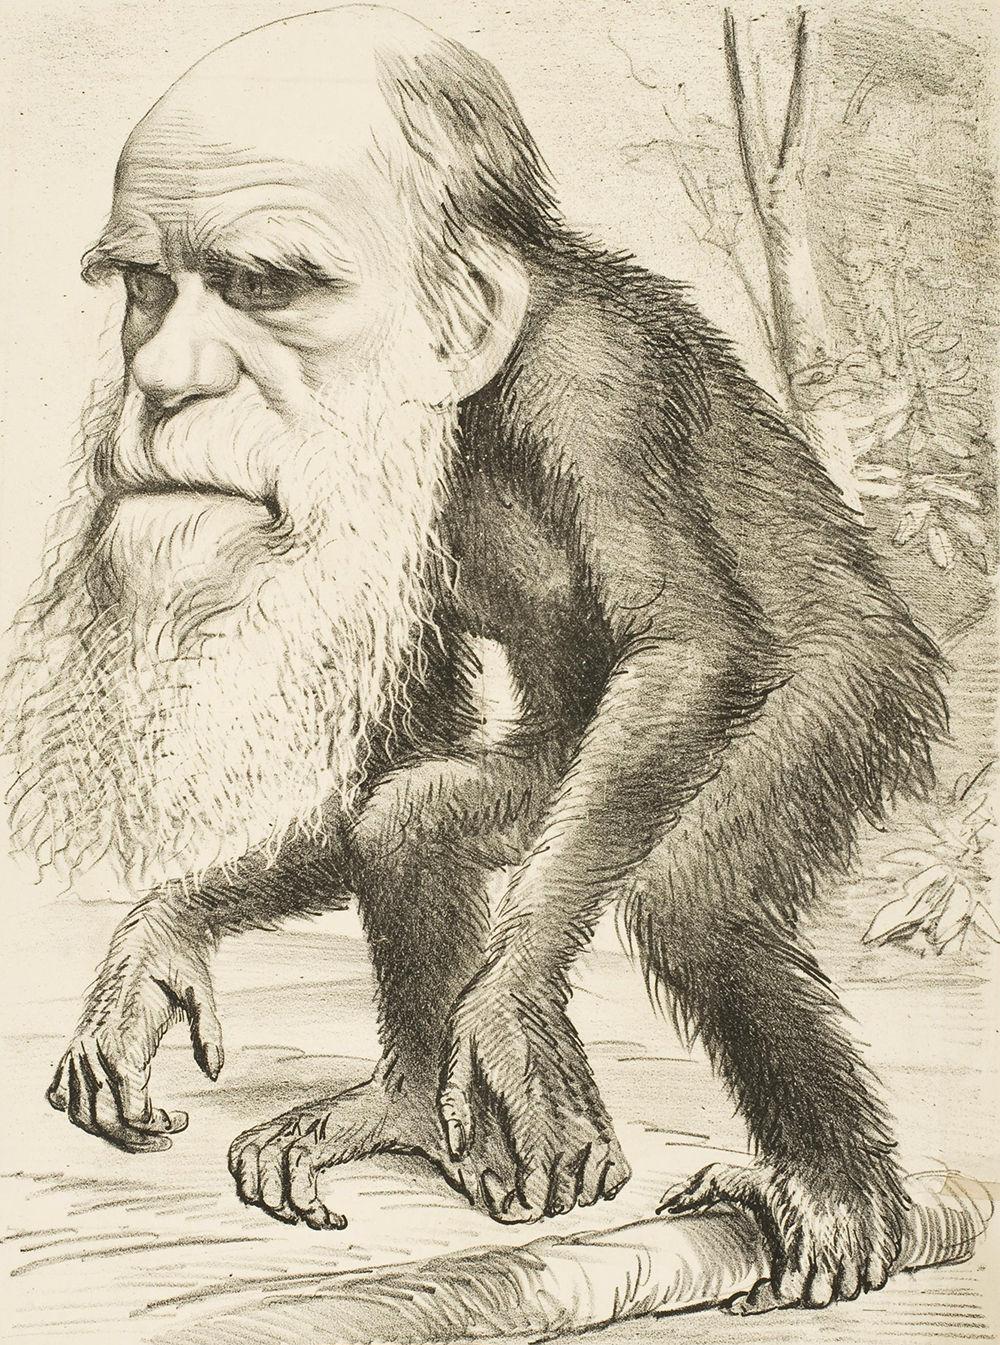 Caricatura de Charles Darwin publicada en la revista satírica The Hornet.